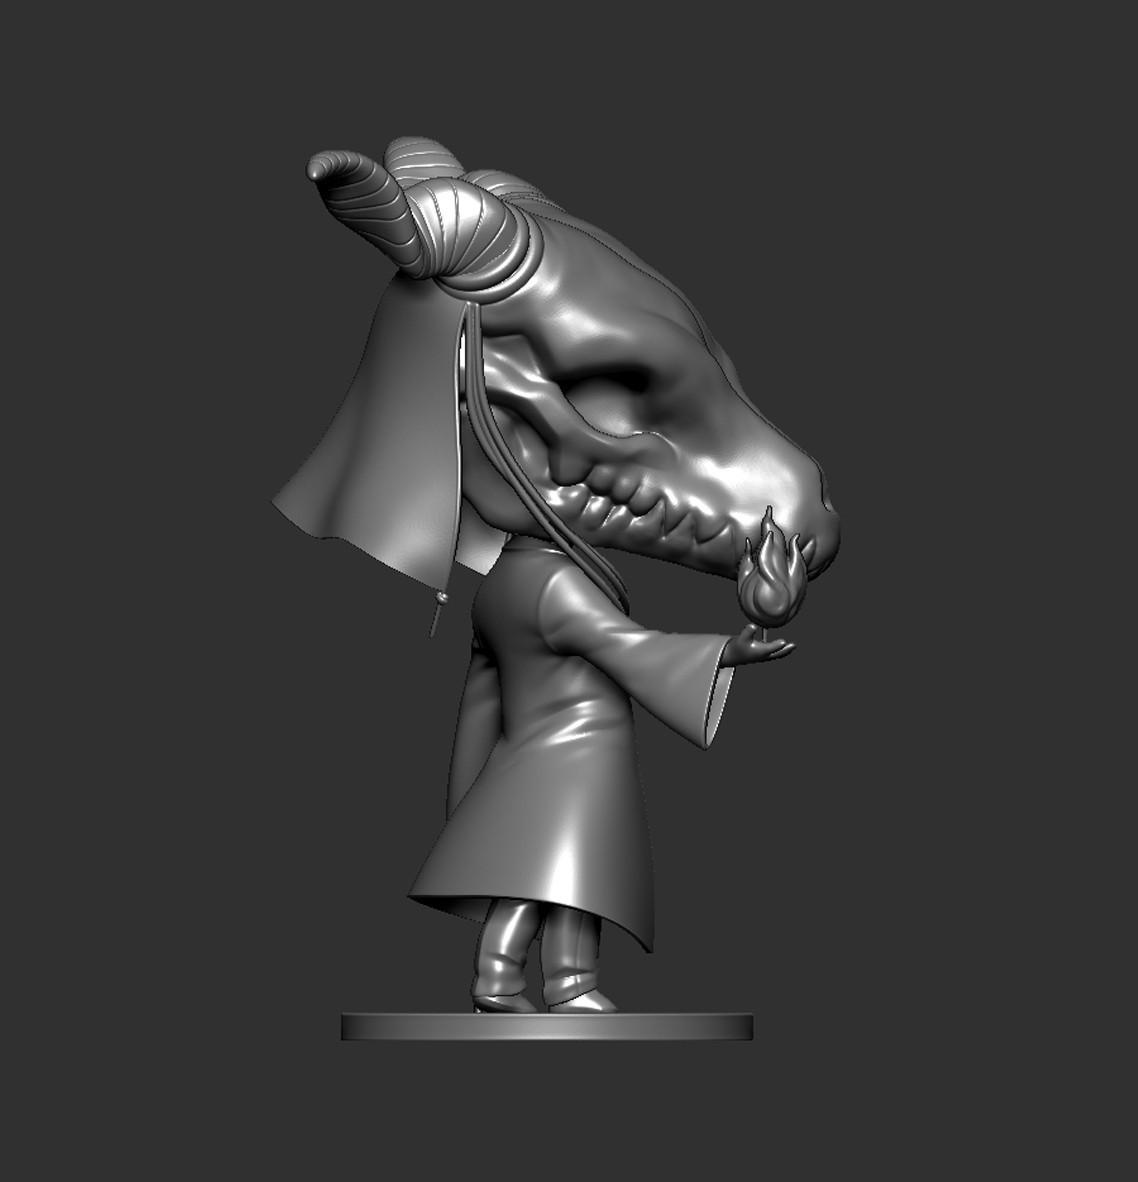 Elias03.jpg Download STL file Elias Ainsworth Chibi figurine • 3D print design, Kownus